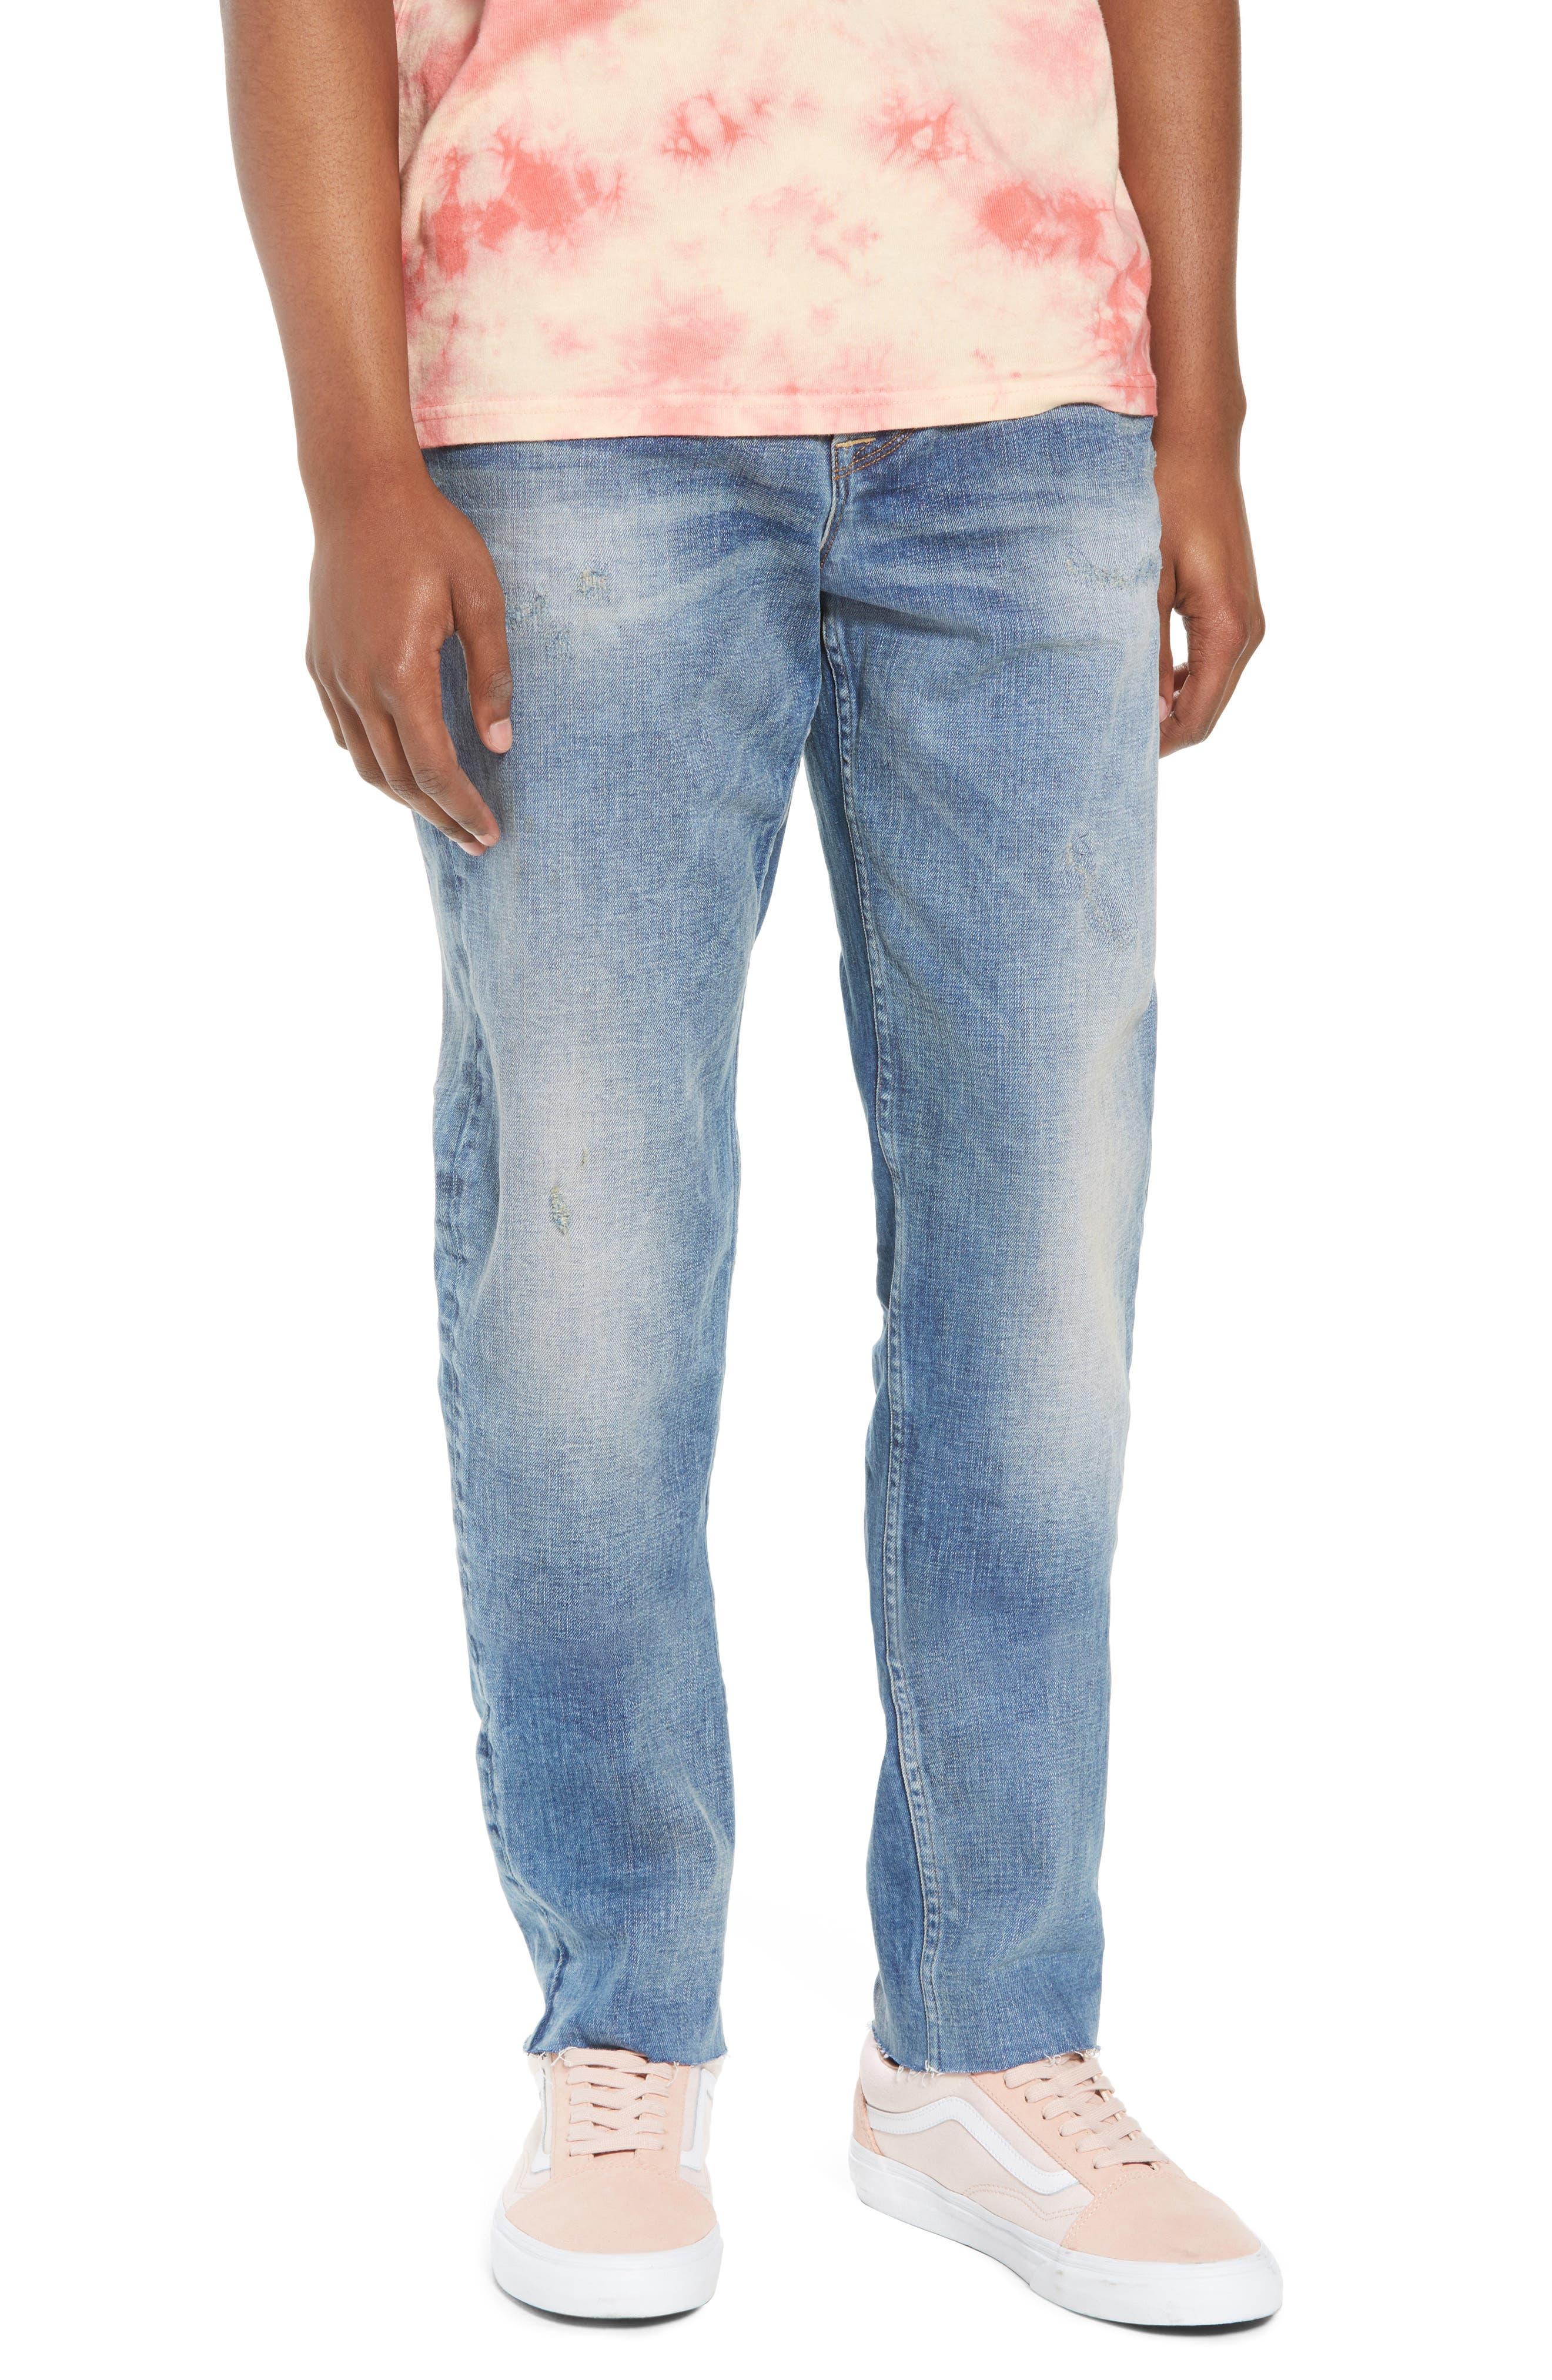 Sartor Slouchy Skinny Fit Jeans,                             Main thumbnail 1, color,                             Los Feliz